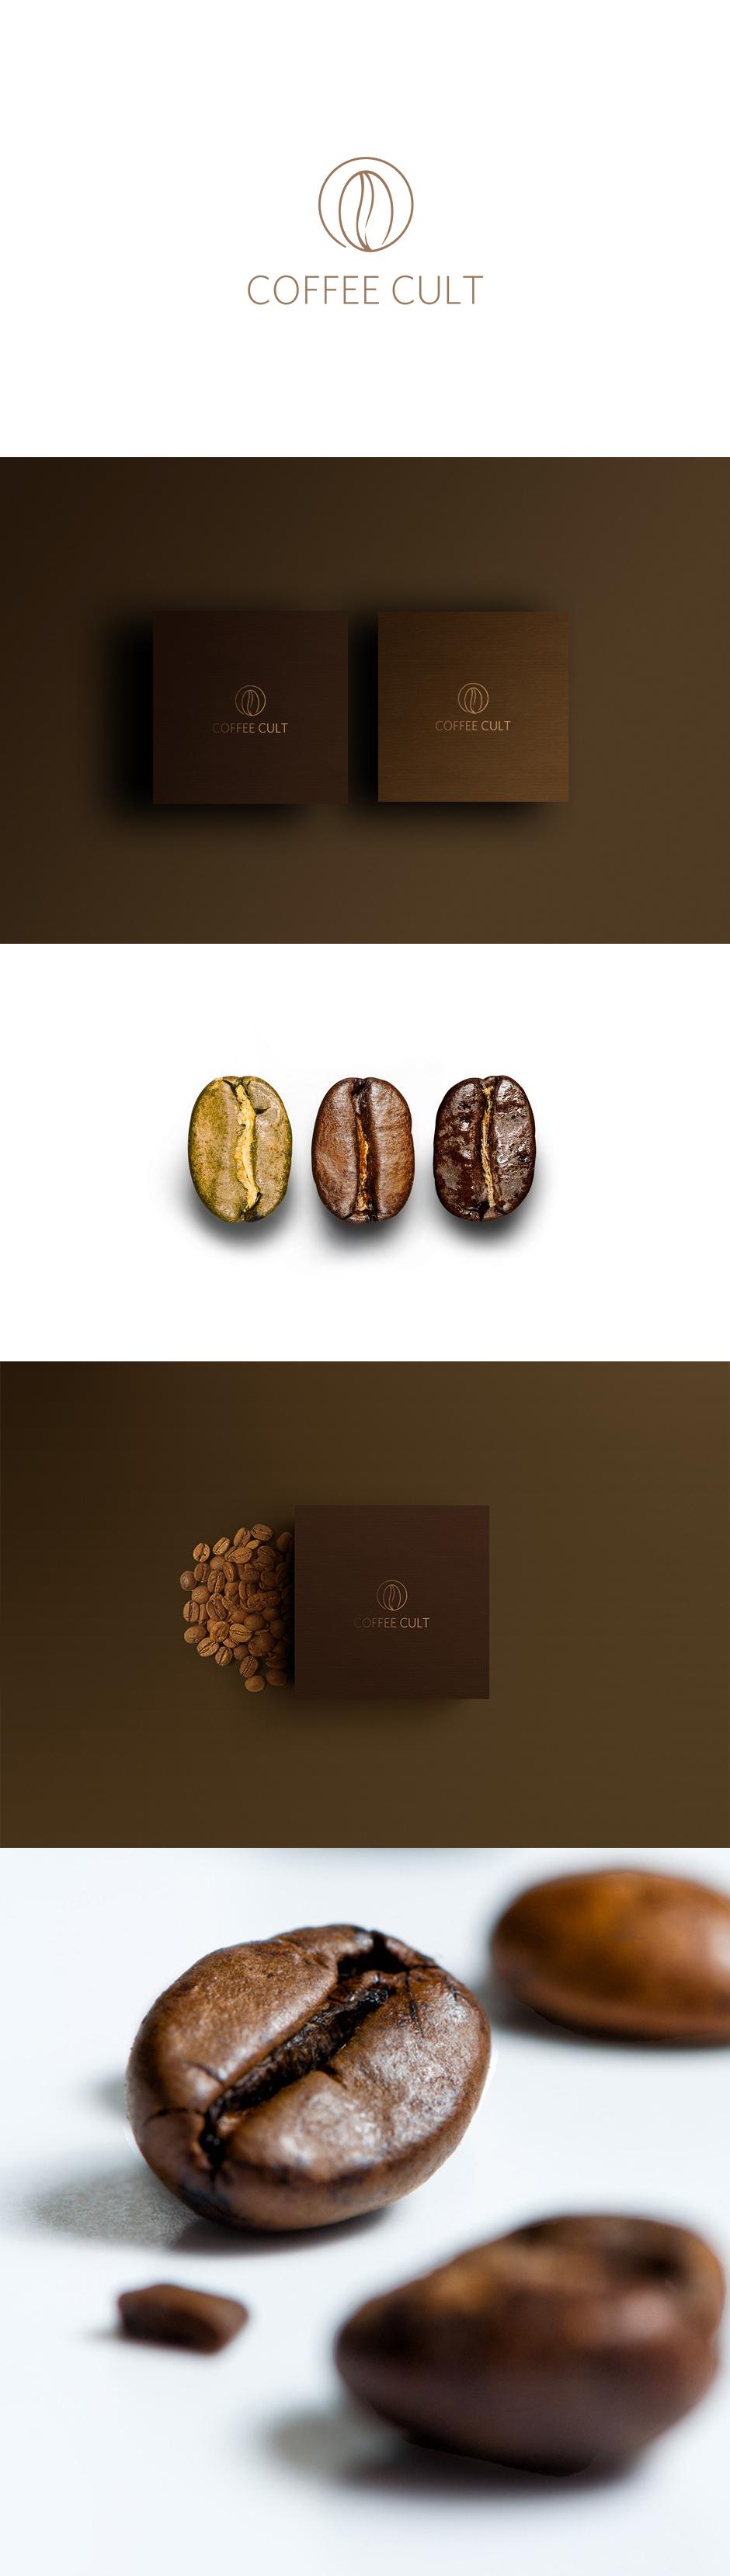 Логотип и фирменный стиль для компании COFFEE CULT фото f_0295bc5ef6323cc9.jpg